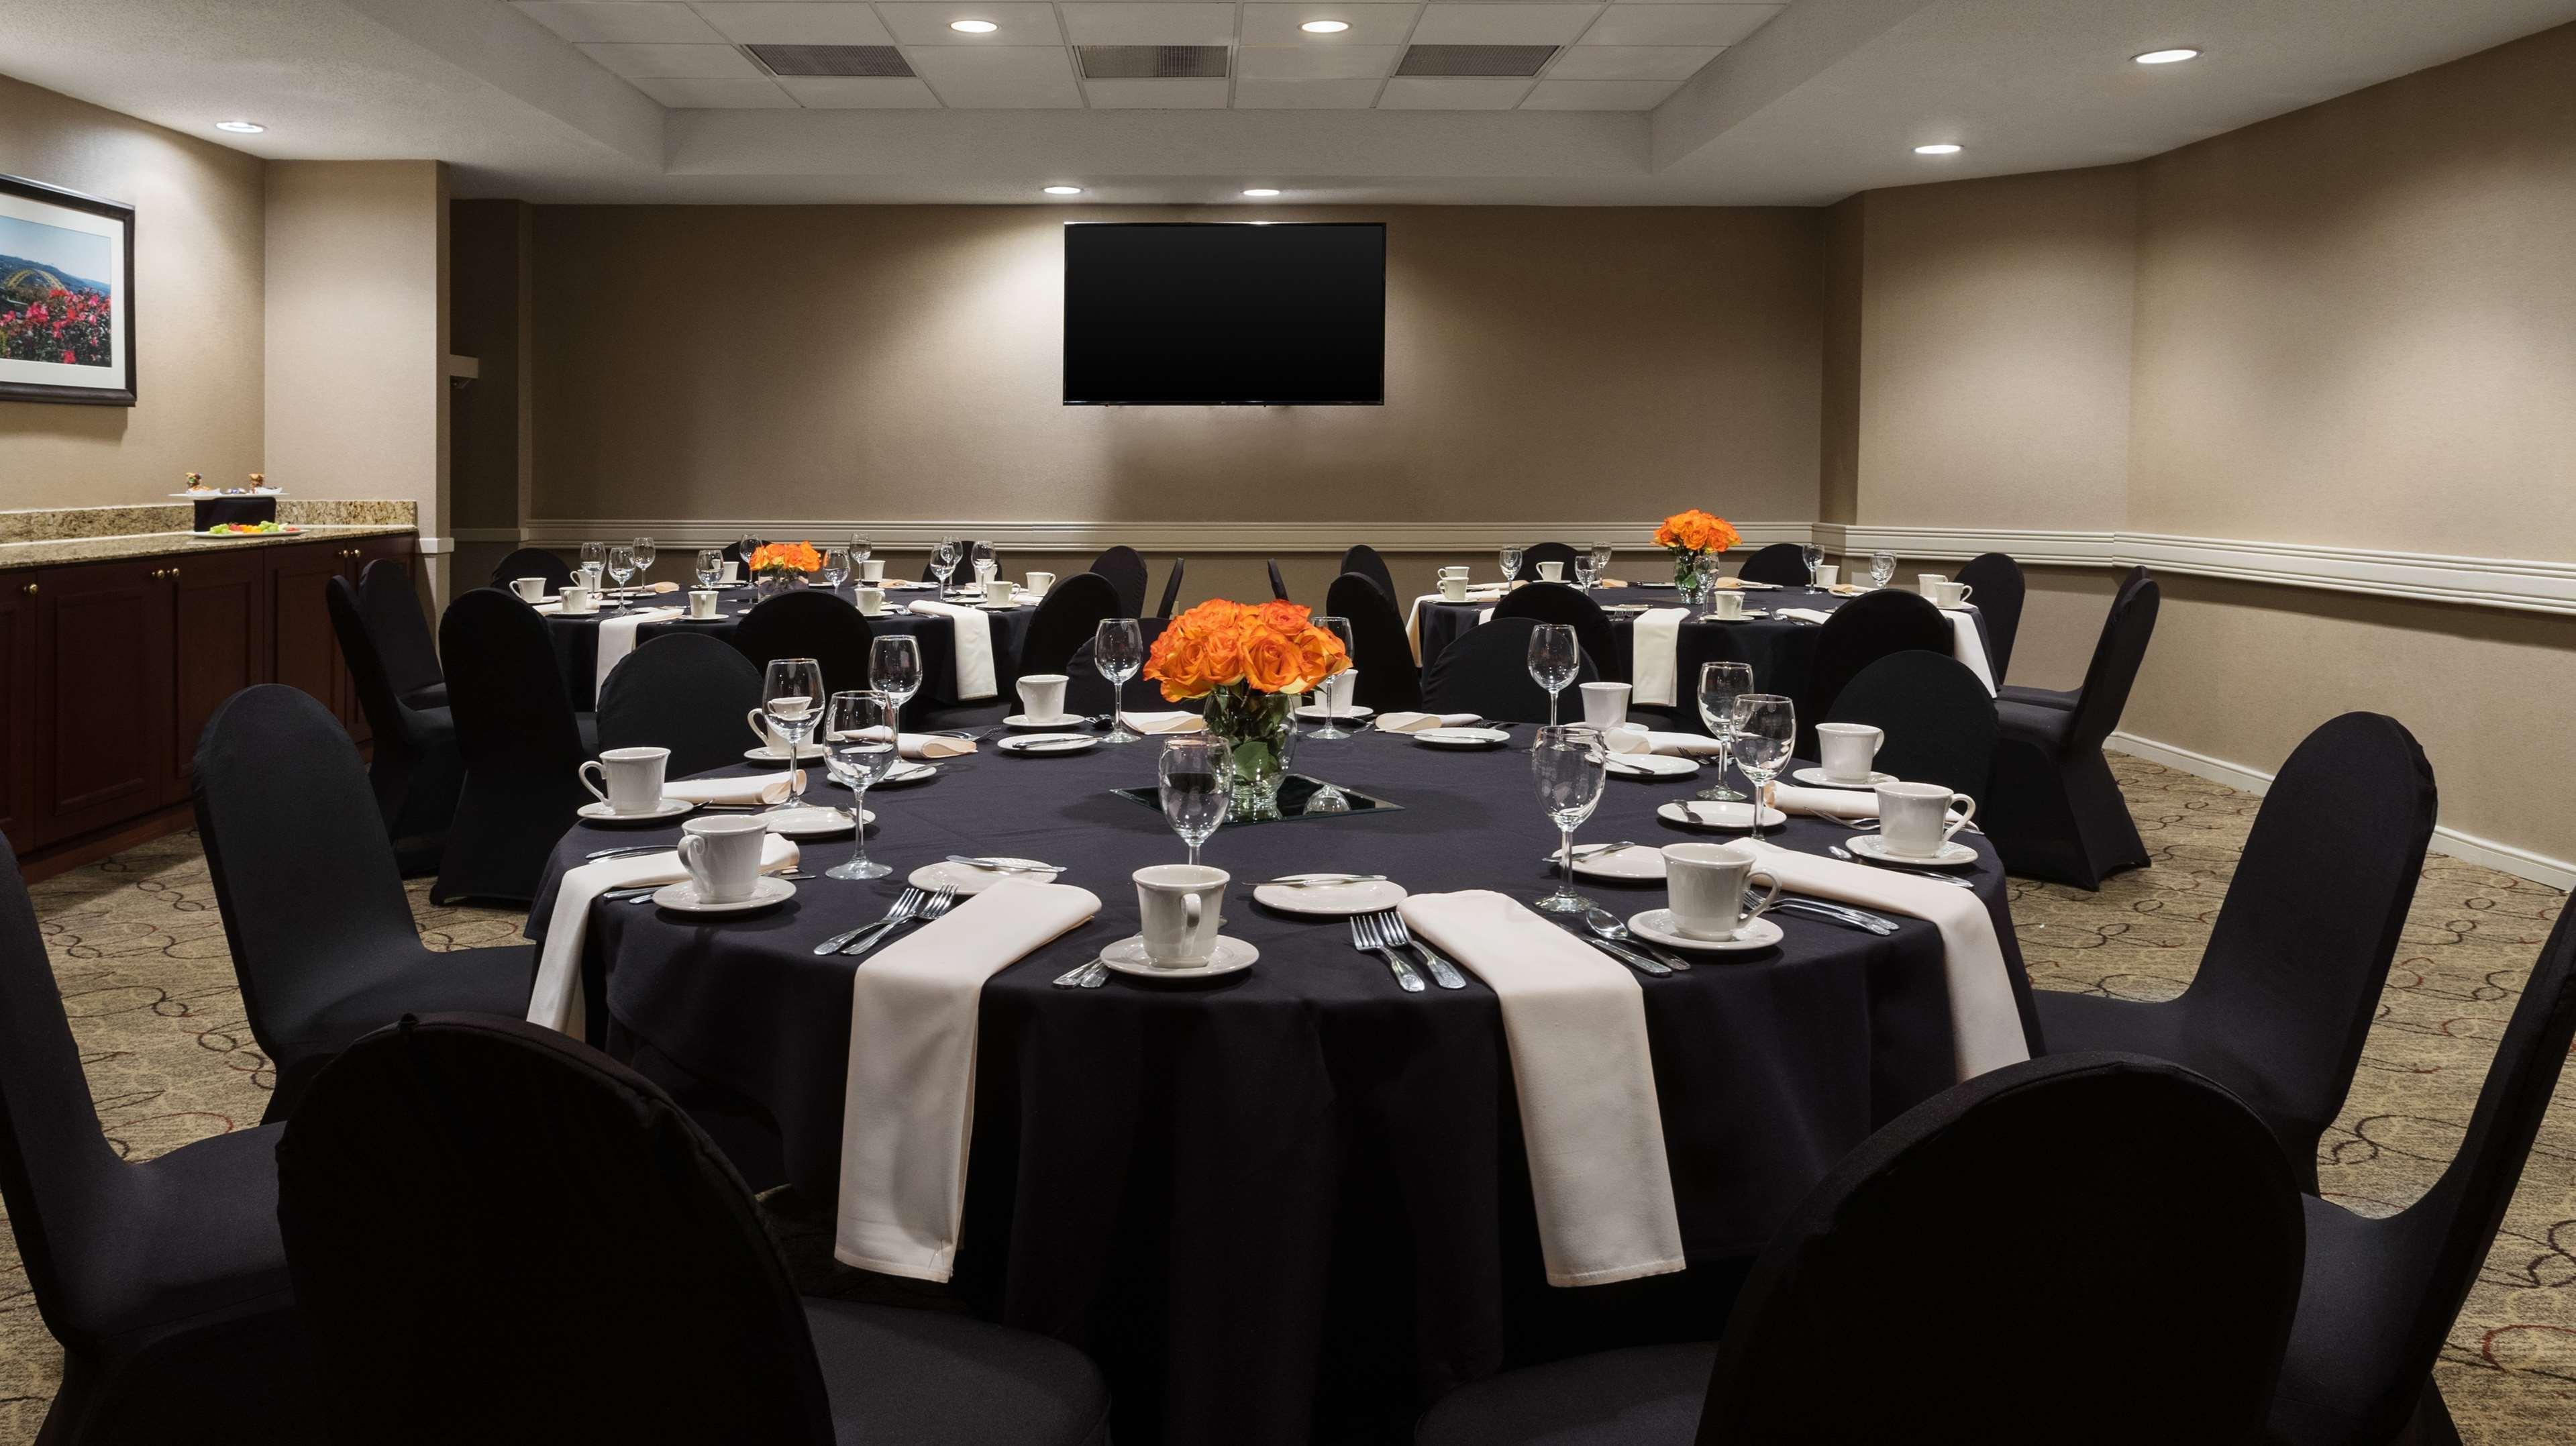 DoubleTree Suites by Hilton Hotel Cincinnati - Blue Ash image 33